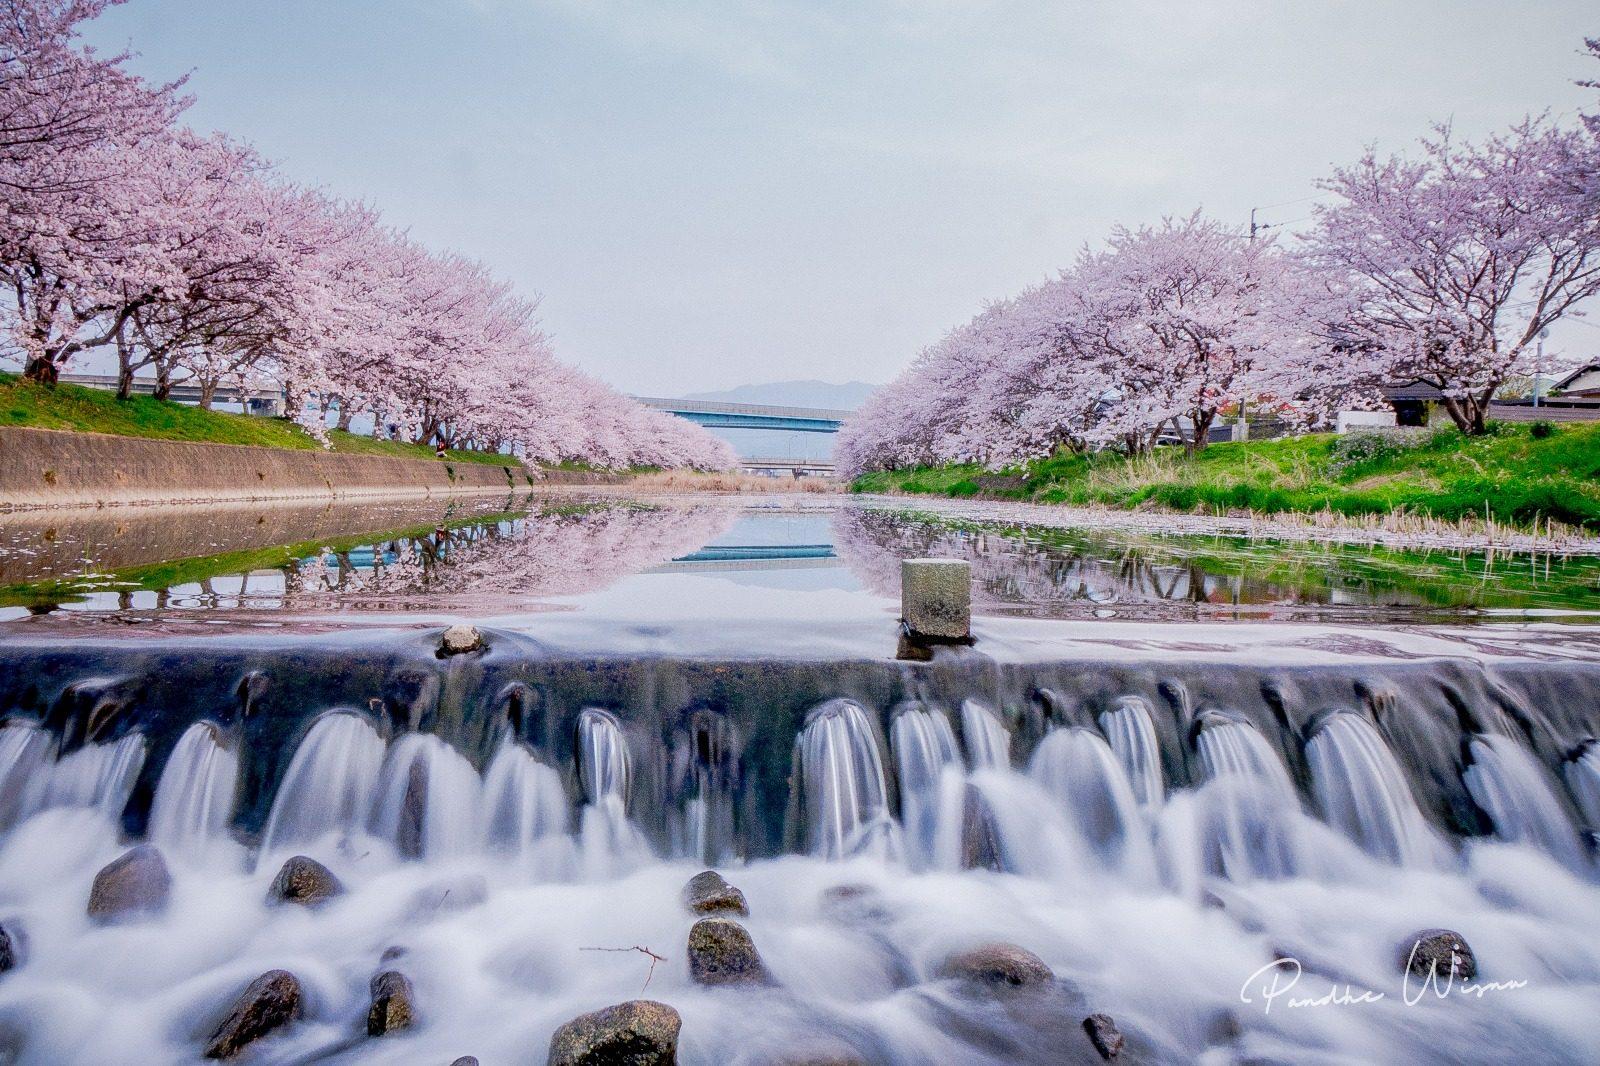 Pandhe Wisnu – The peaceful beauty